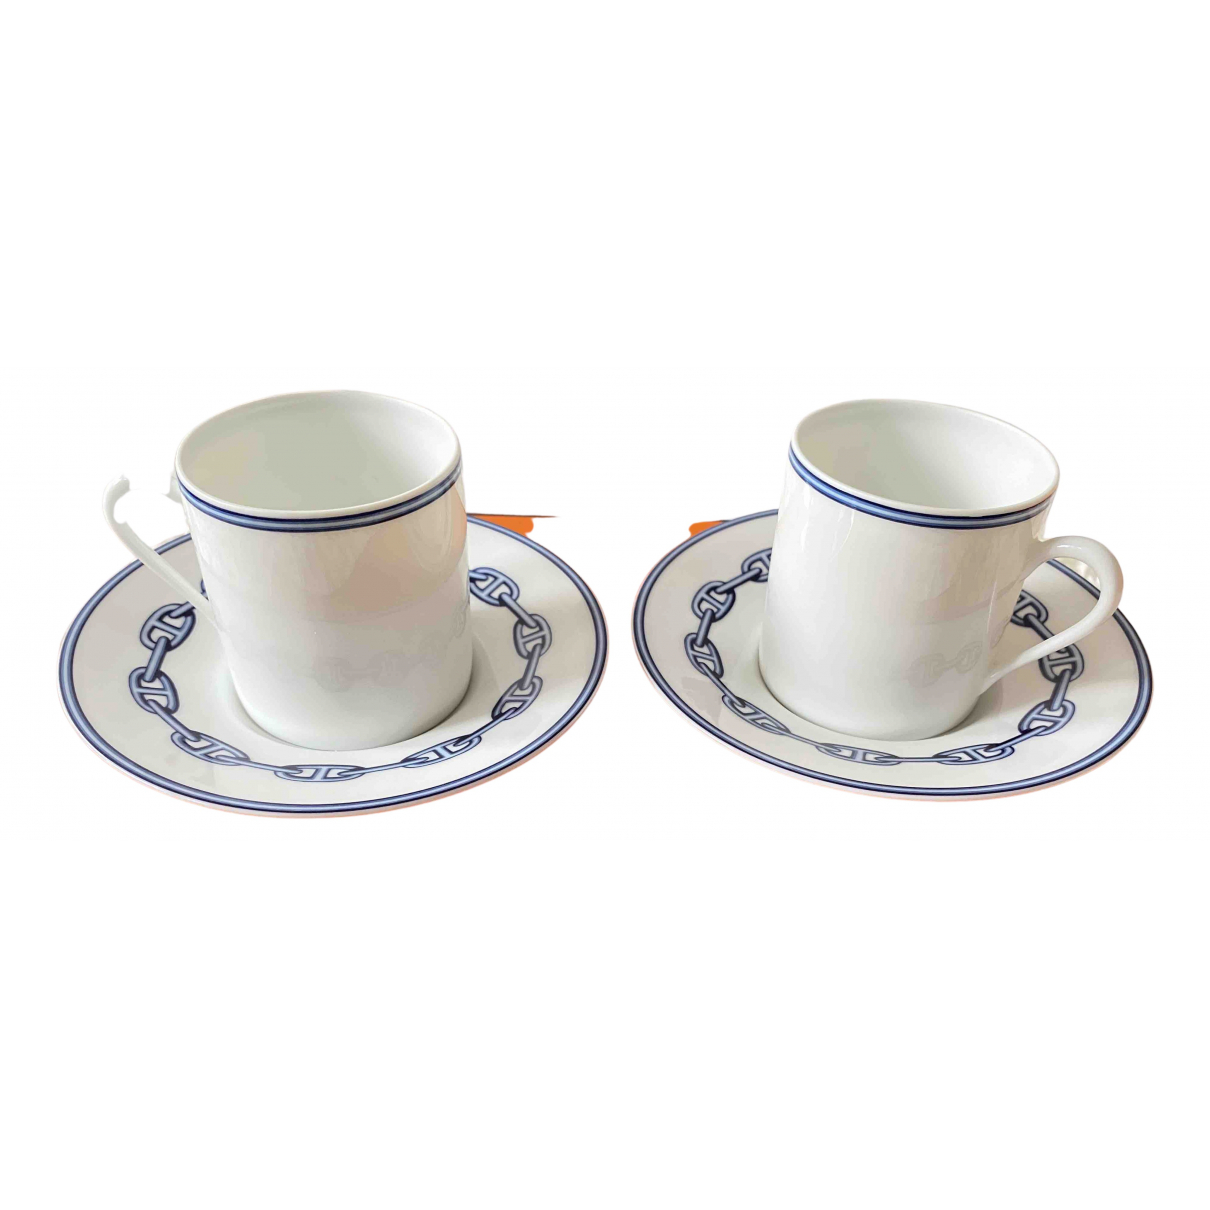 Juego de te/cafe Chaine dancre de Porcelana Hermes